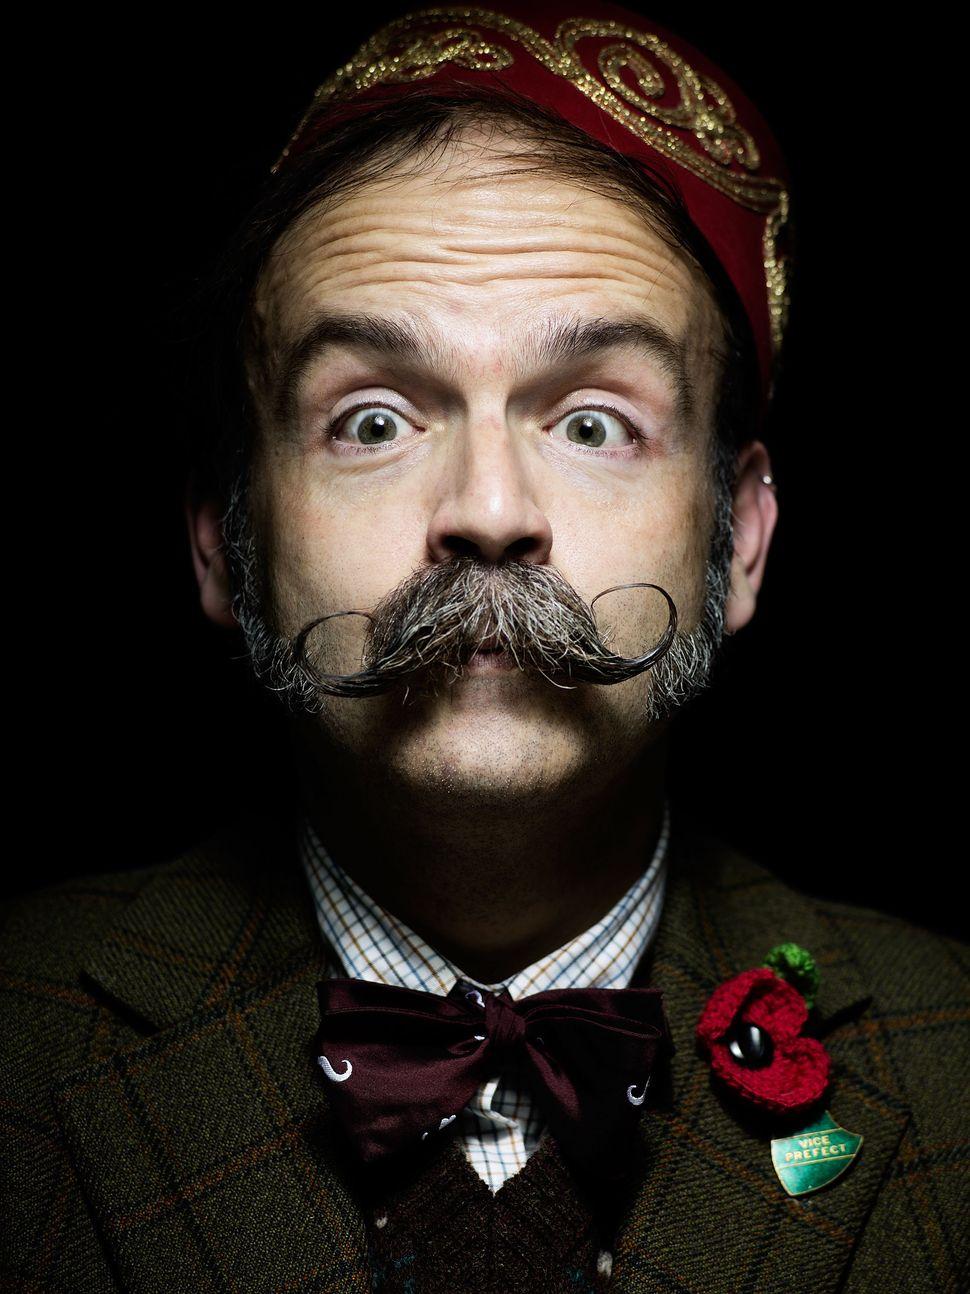 Handlebar Club member Aaron Burns, with a classic handlebar moustache.